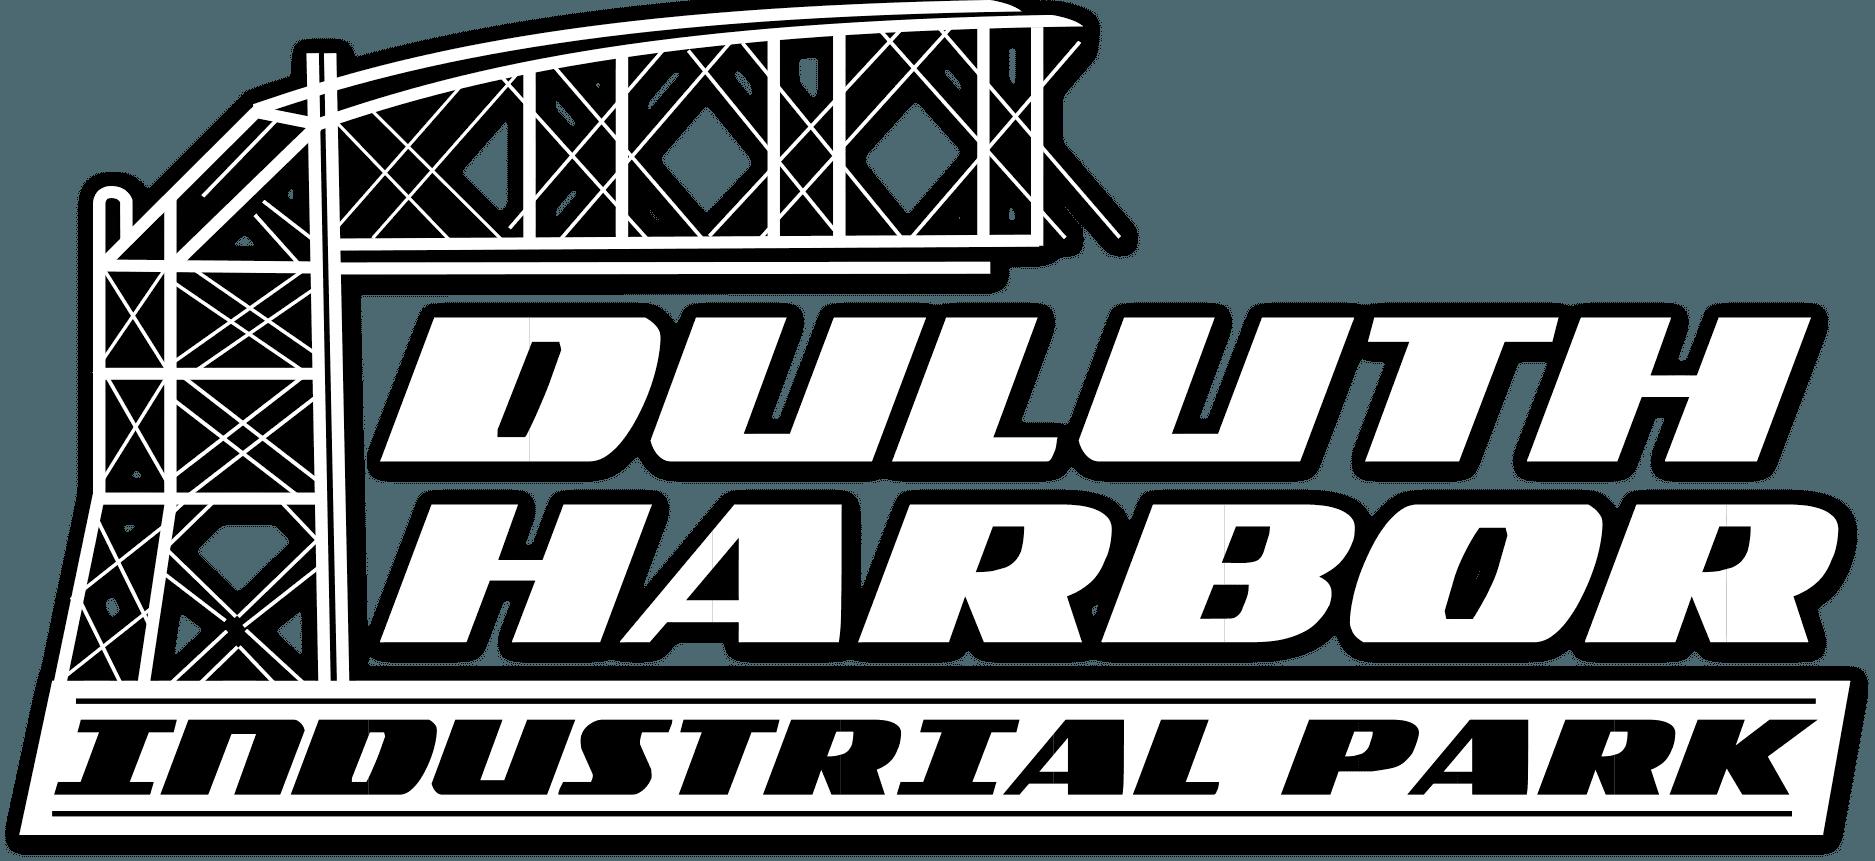 duluth harbor industrial park